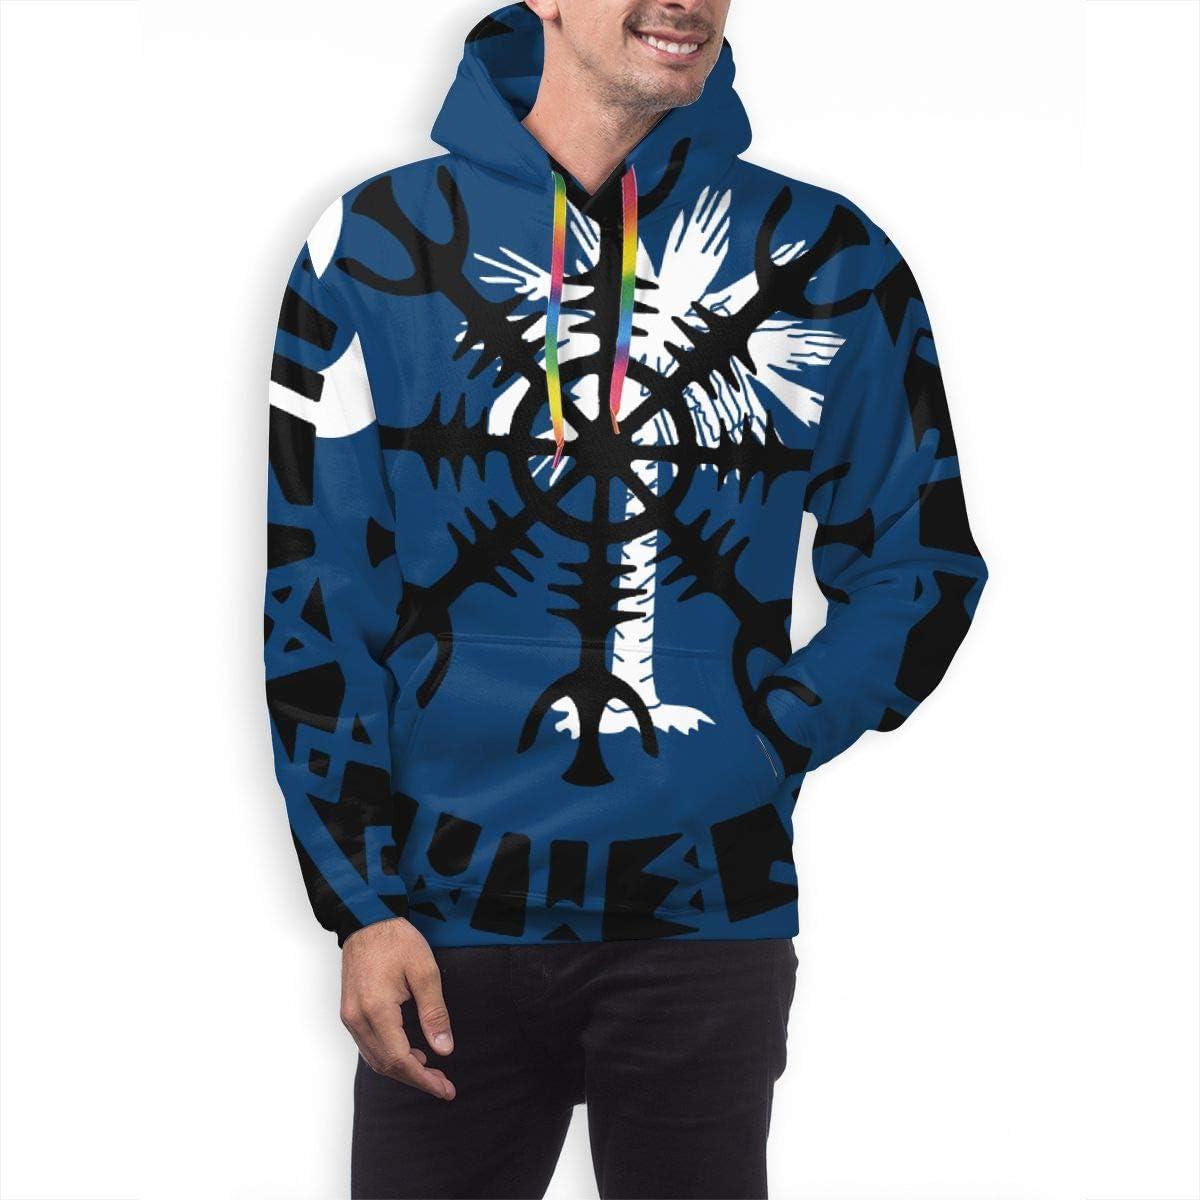 Flag of South Carolina Vikings Helm of Awe Rune Protection Norse Mens Polyester Pullover Hoodie Sweatshirt